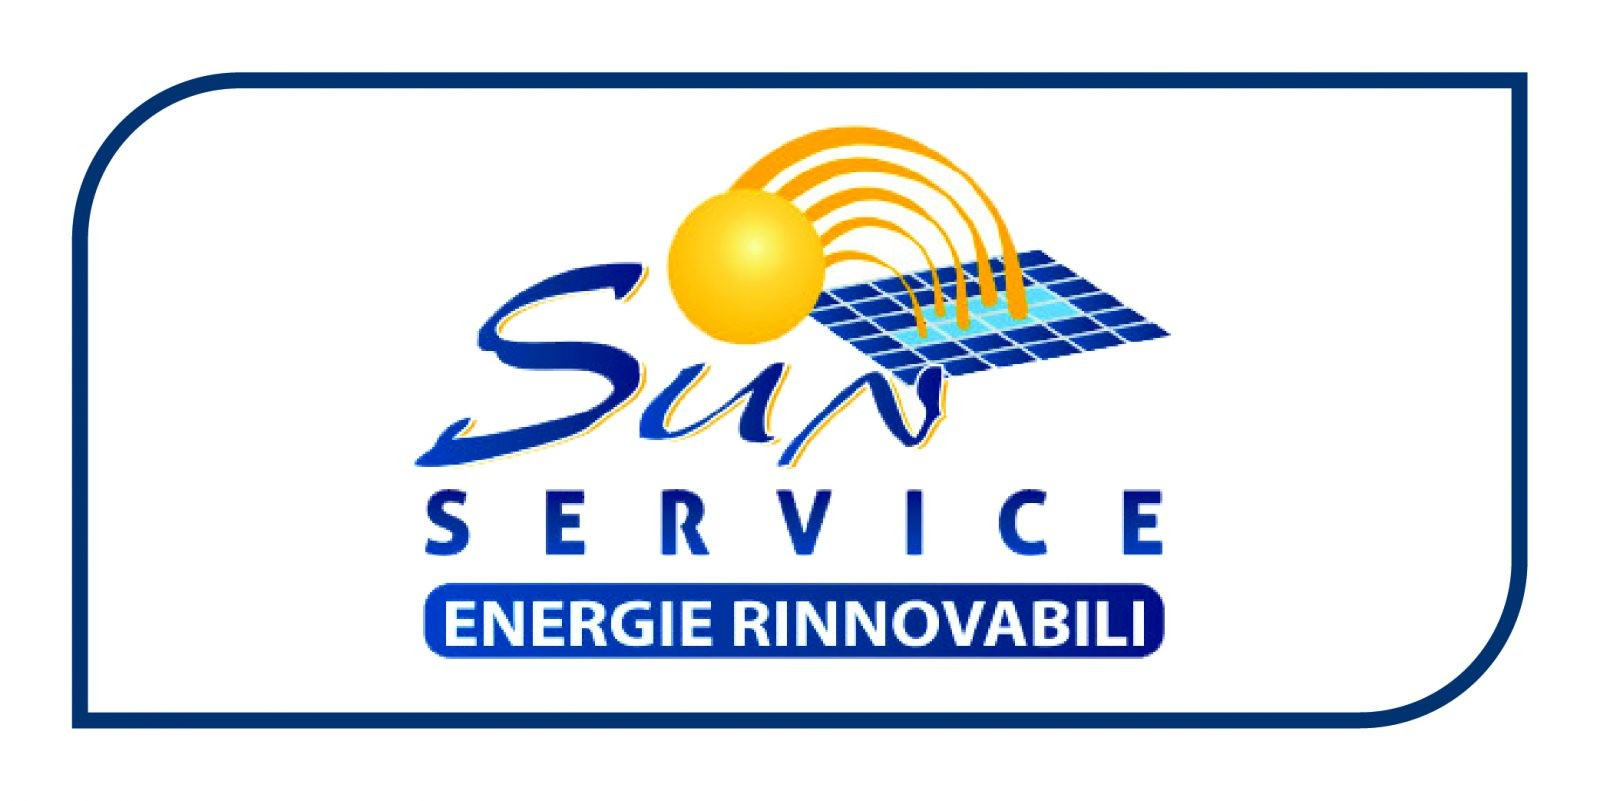 Sun Service - Energie Rinnovabili